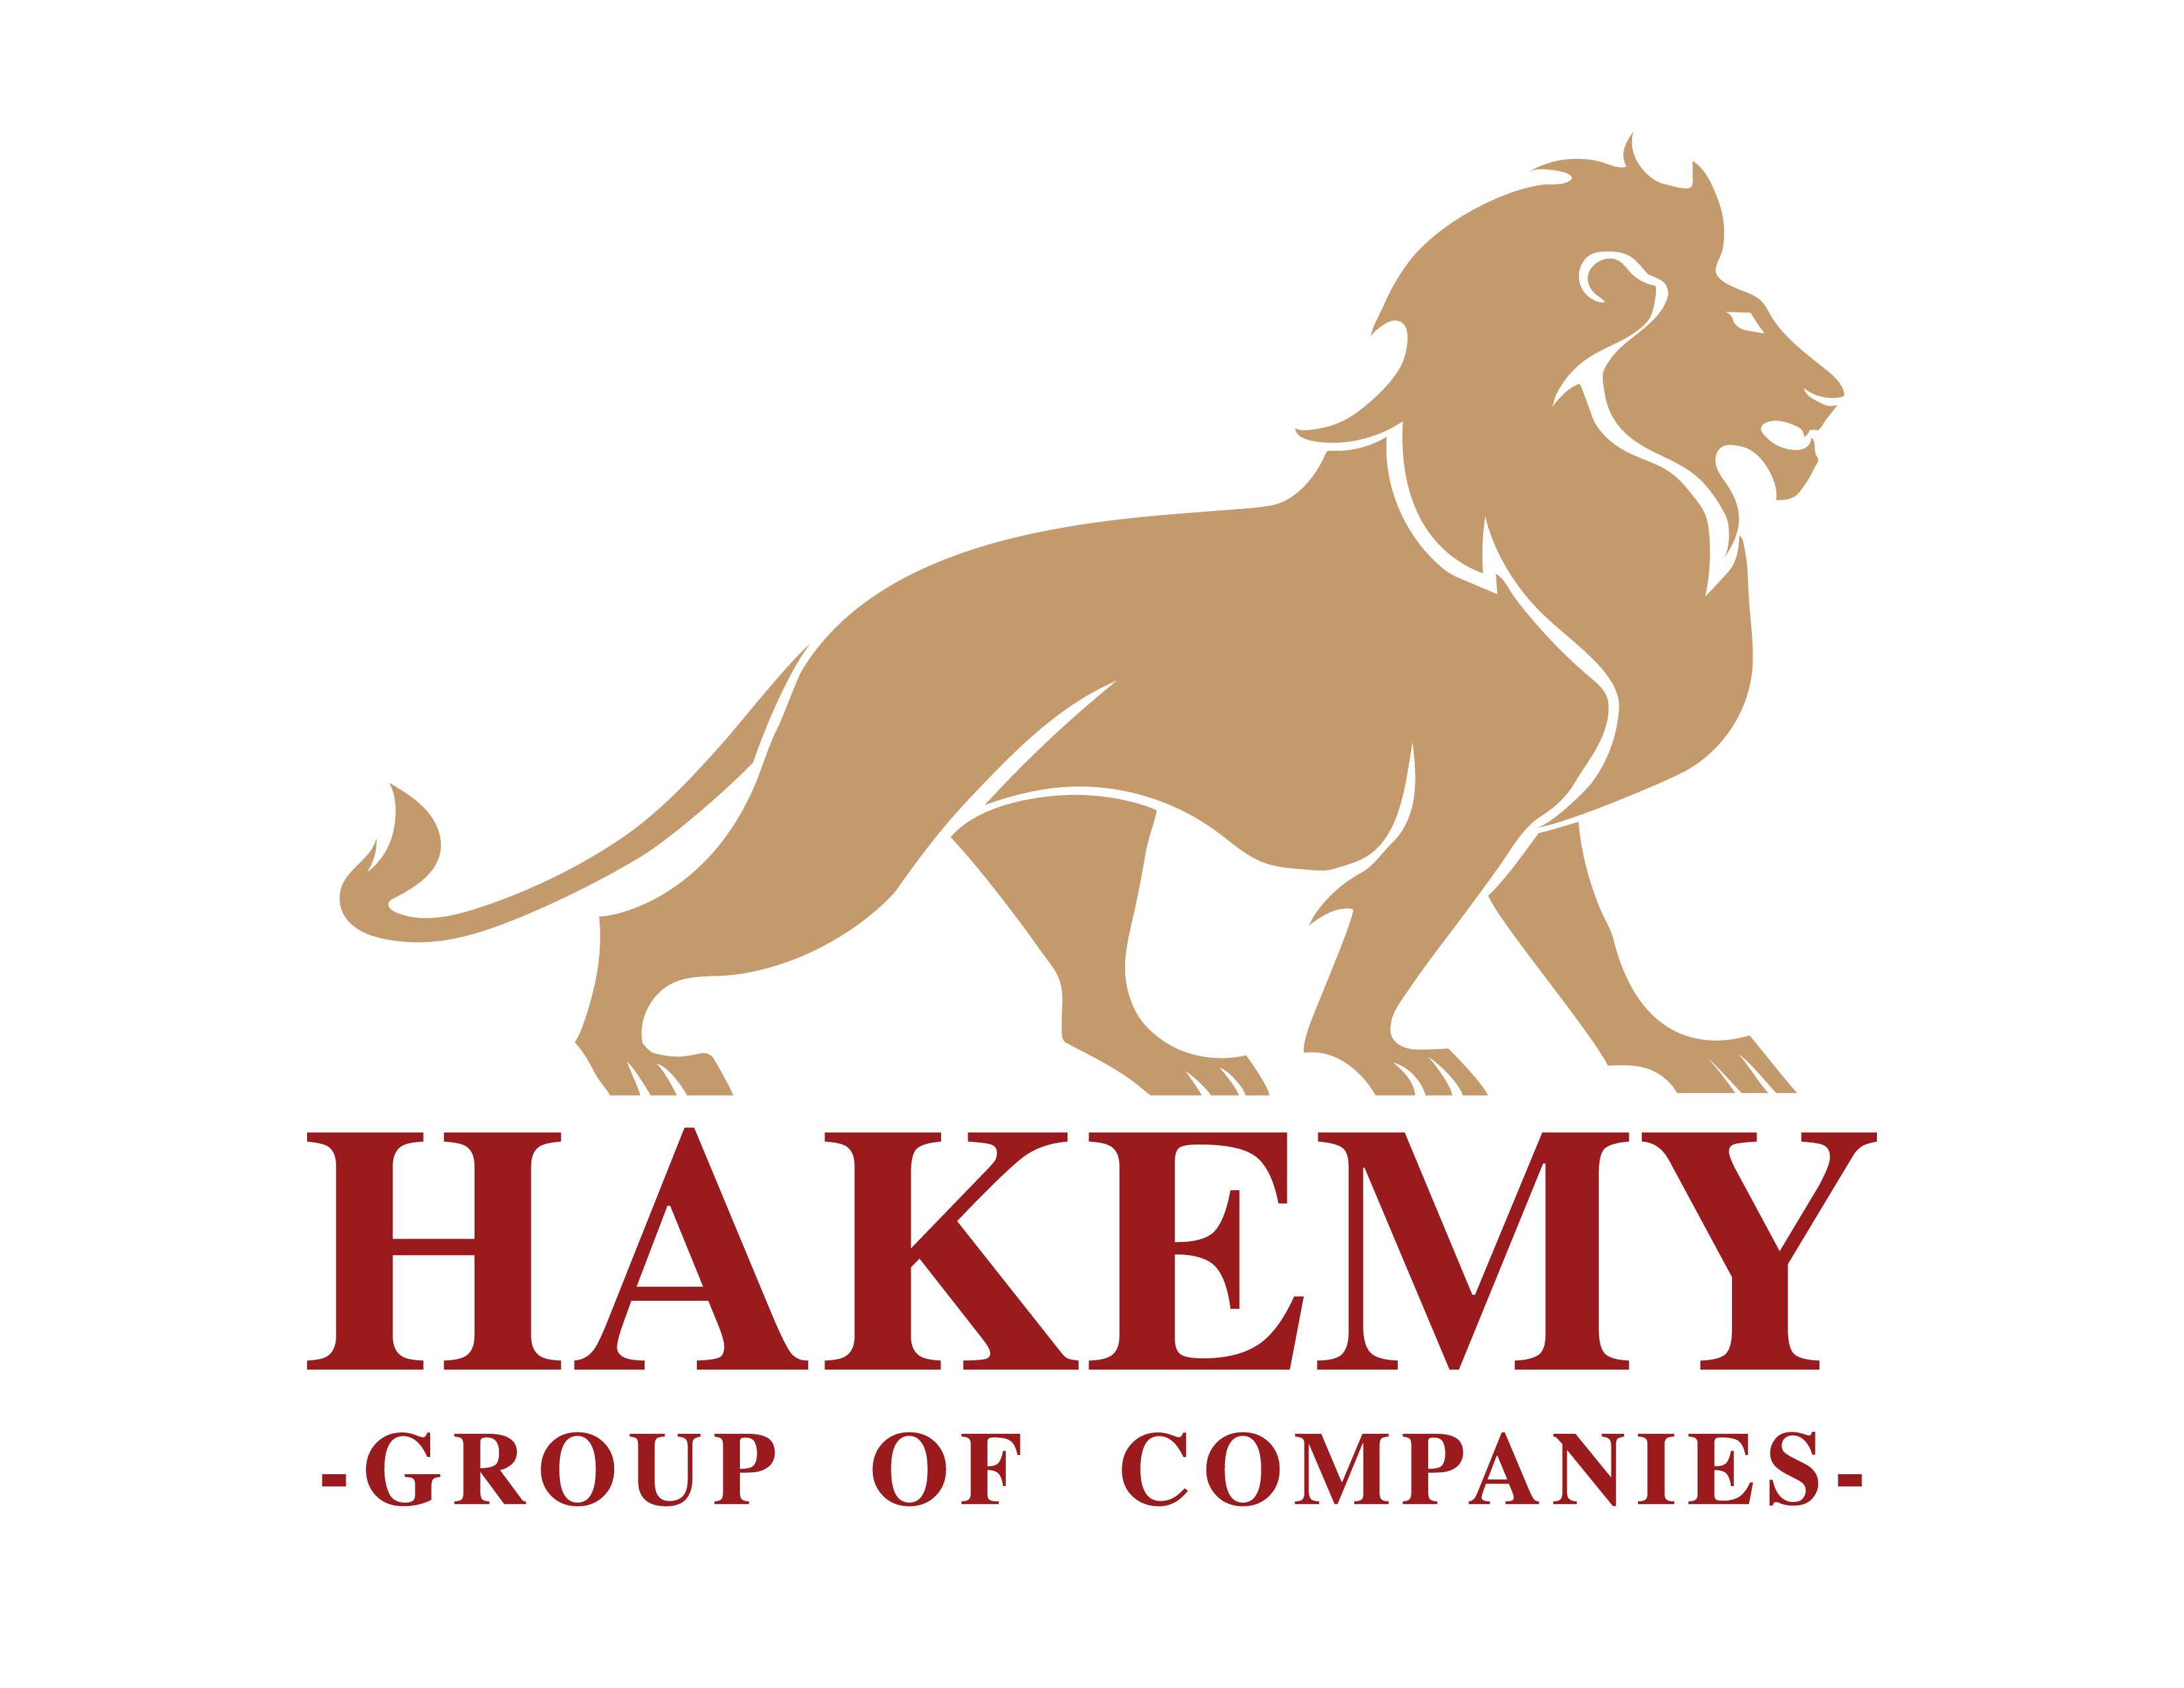 HAKEMY LION LOGO